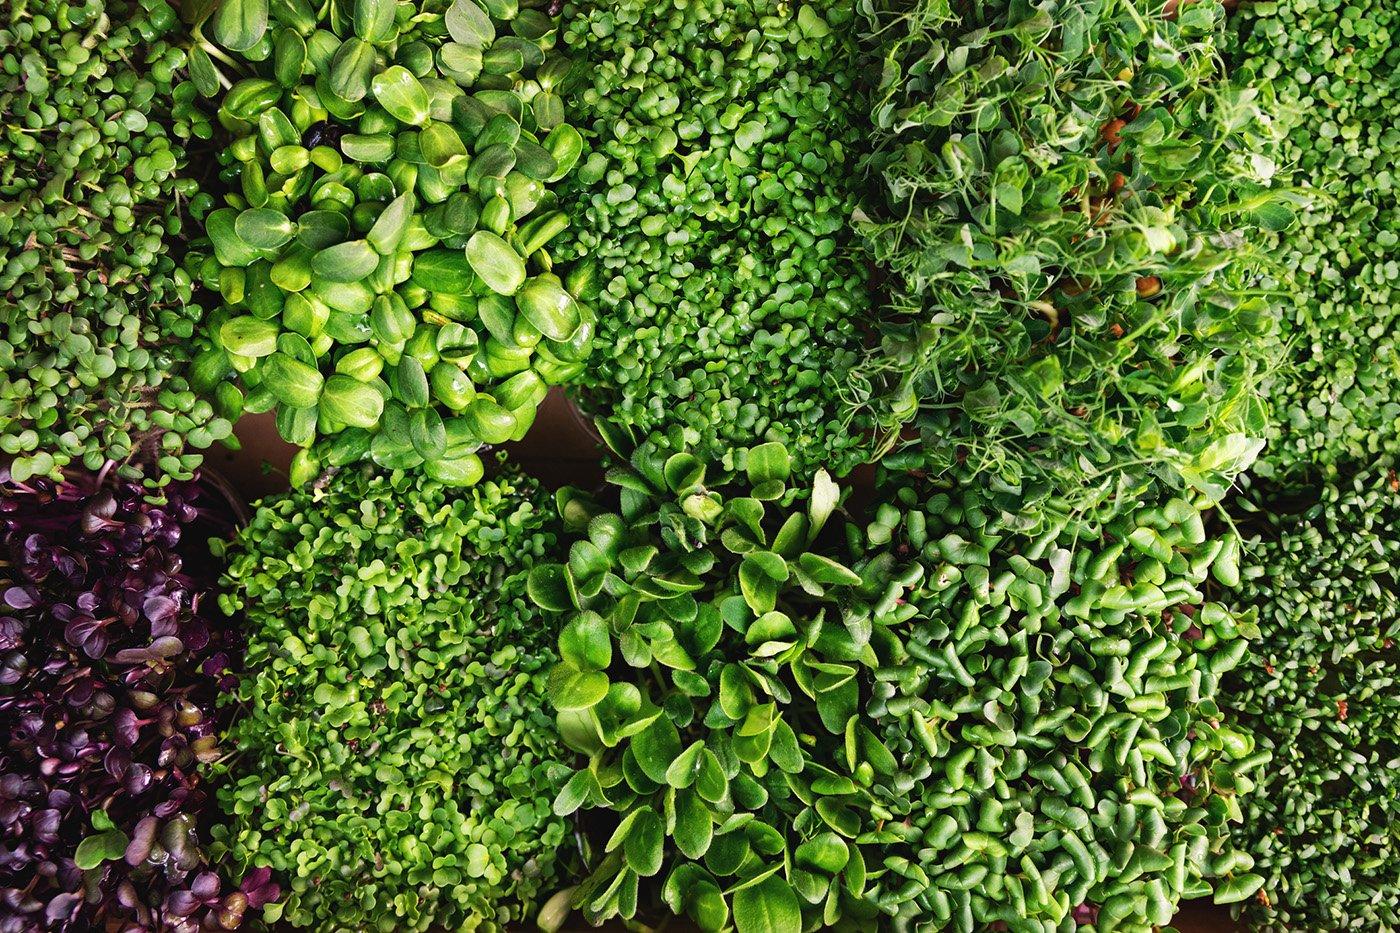 growing microgreens at home